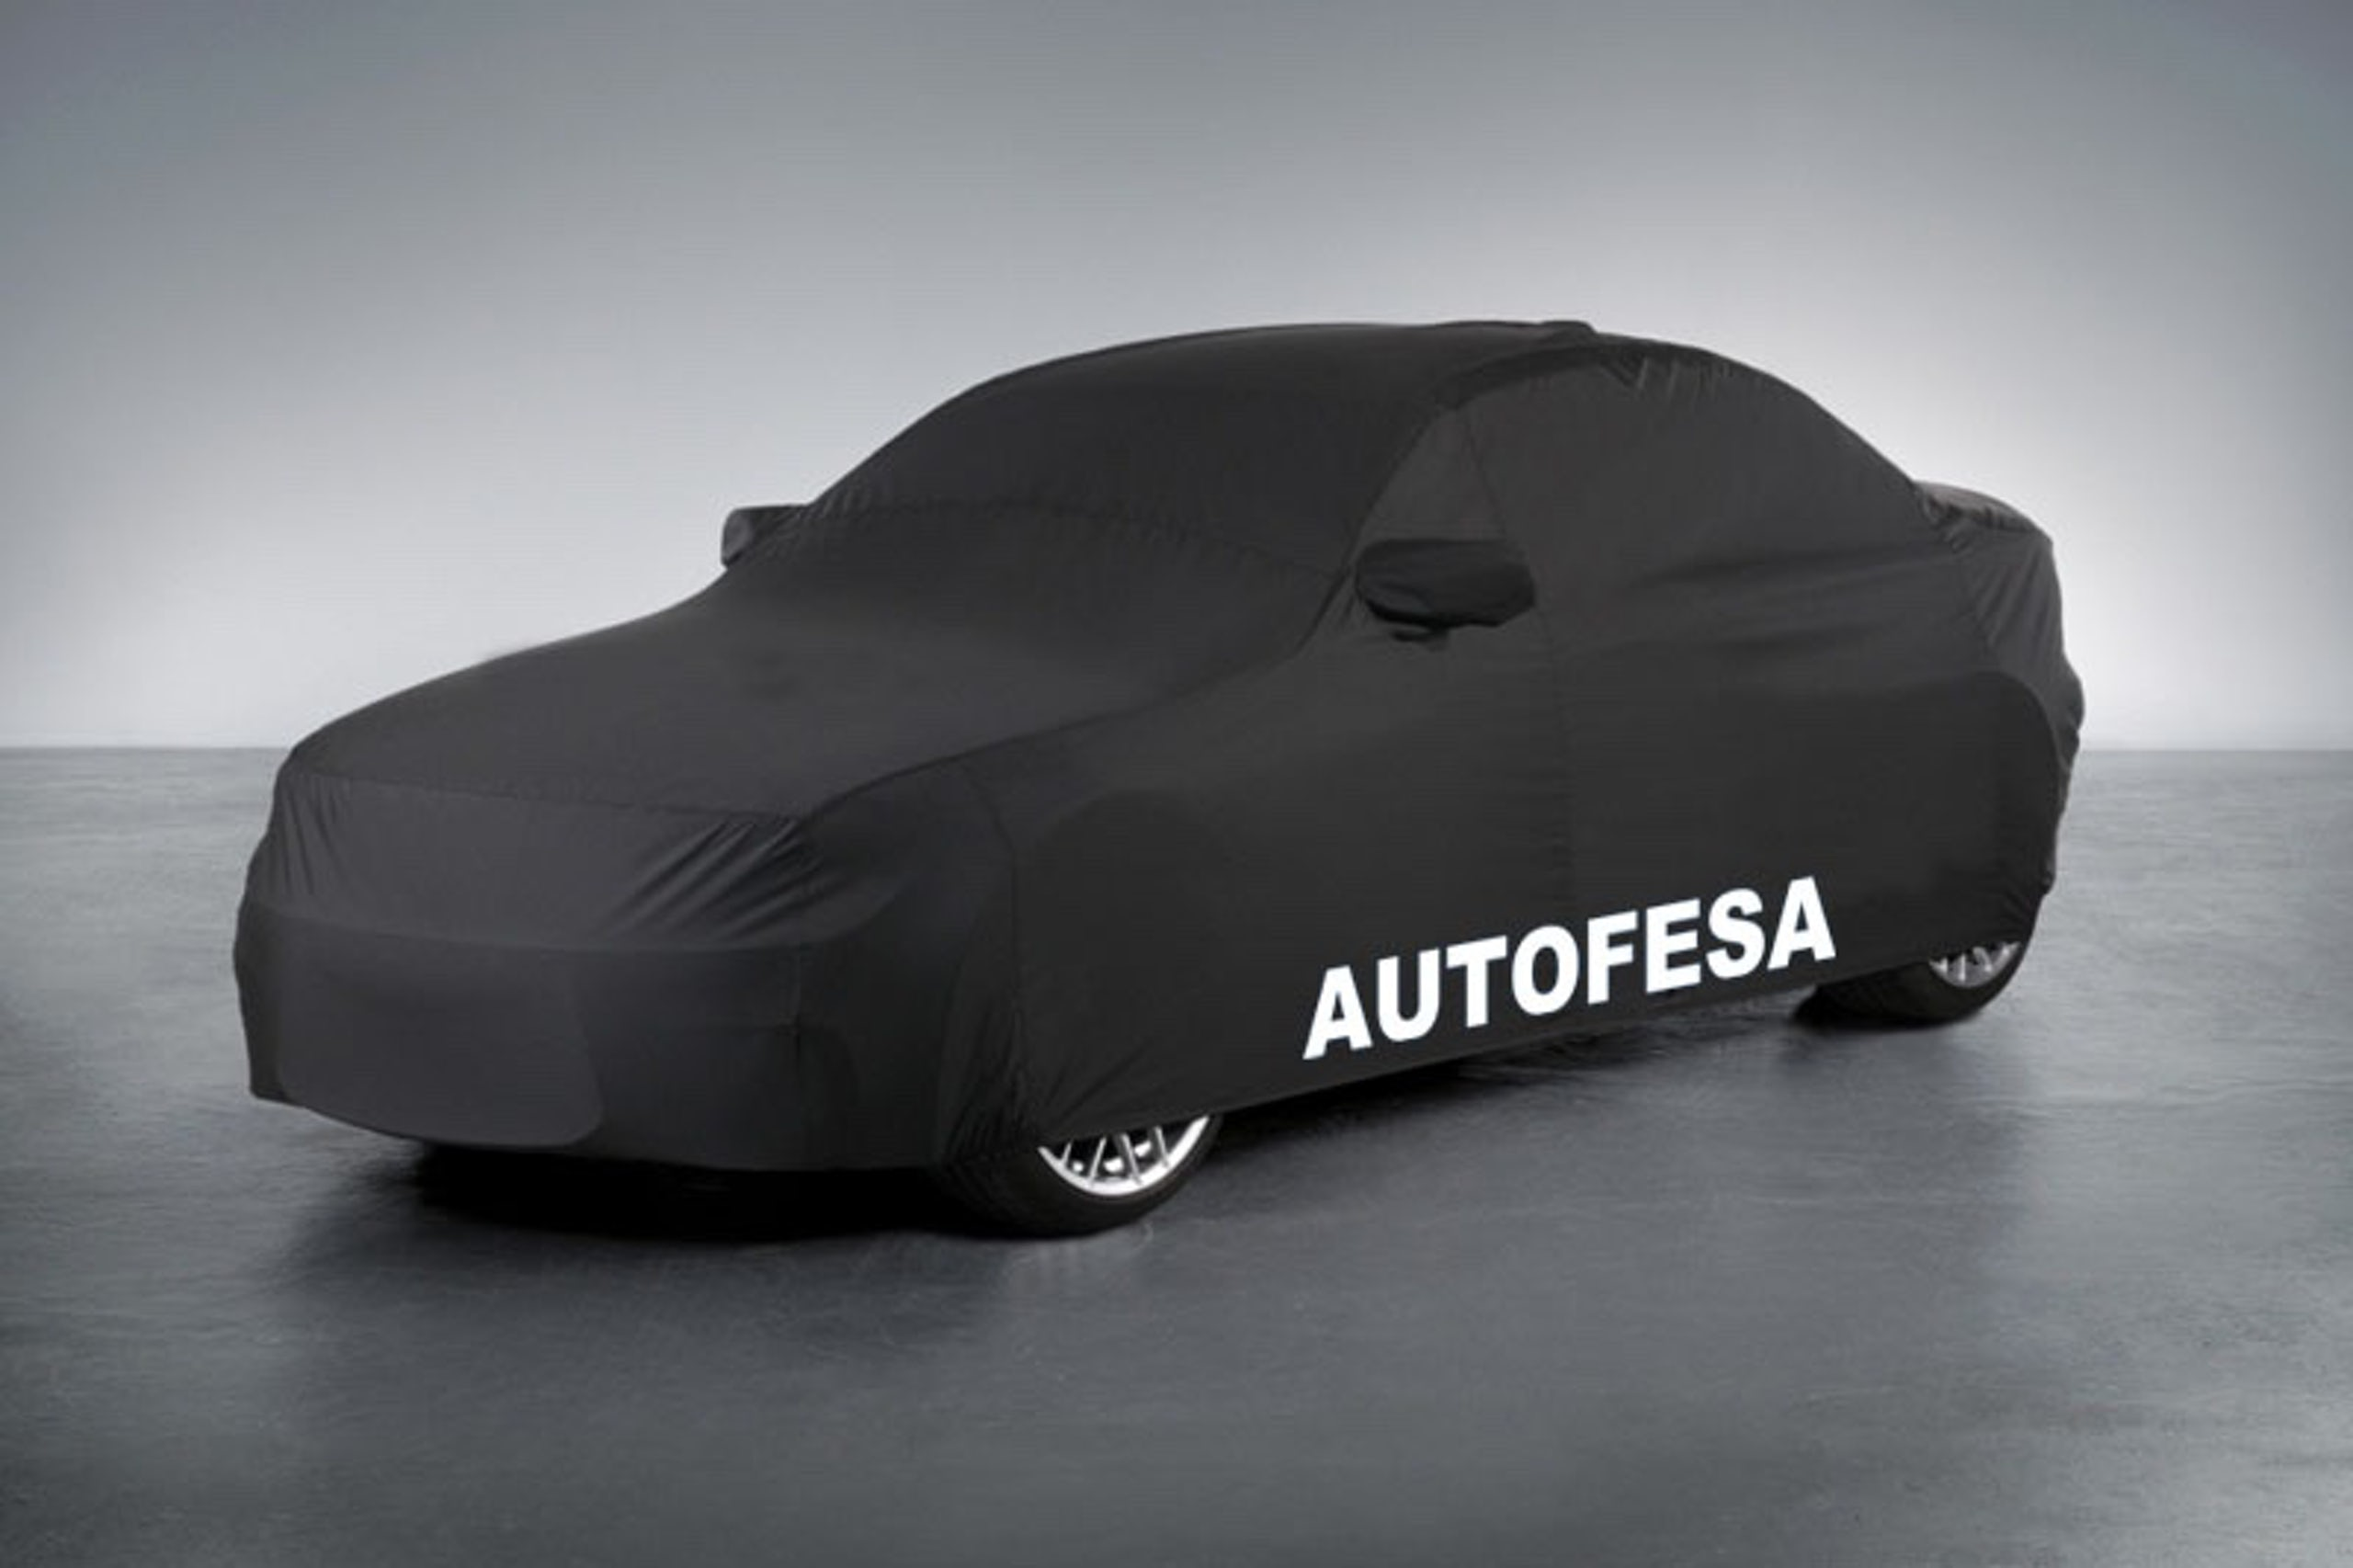 Audi A6 A6Avant COMPETITION ABT 3.0 TDI V6 T 326cv quattro 5p S tronic 4x4 Cpmpetition ABT S/S - Foto 15